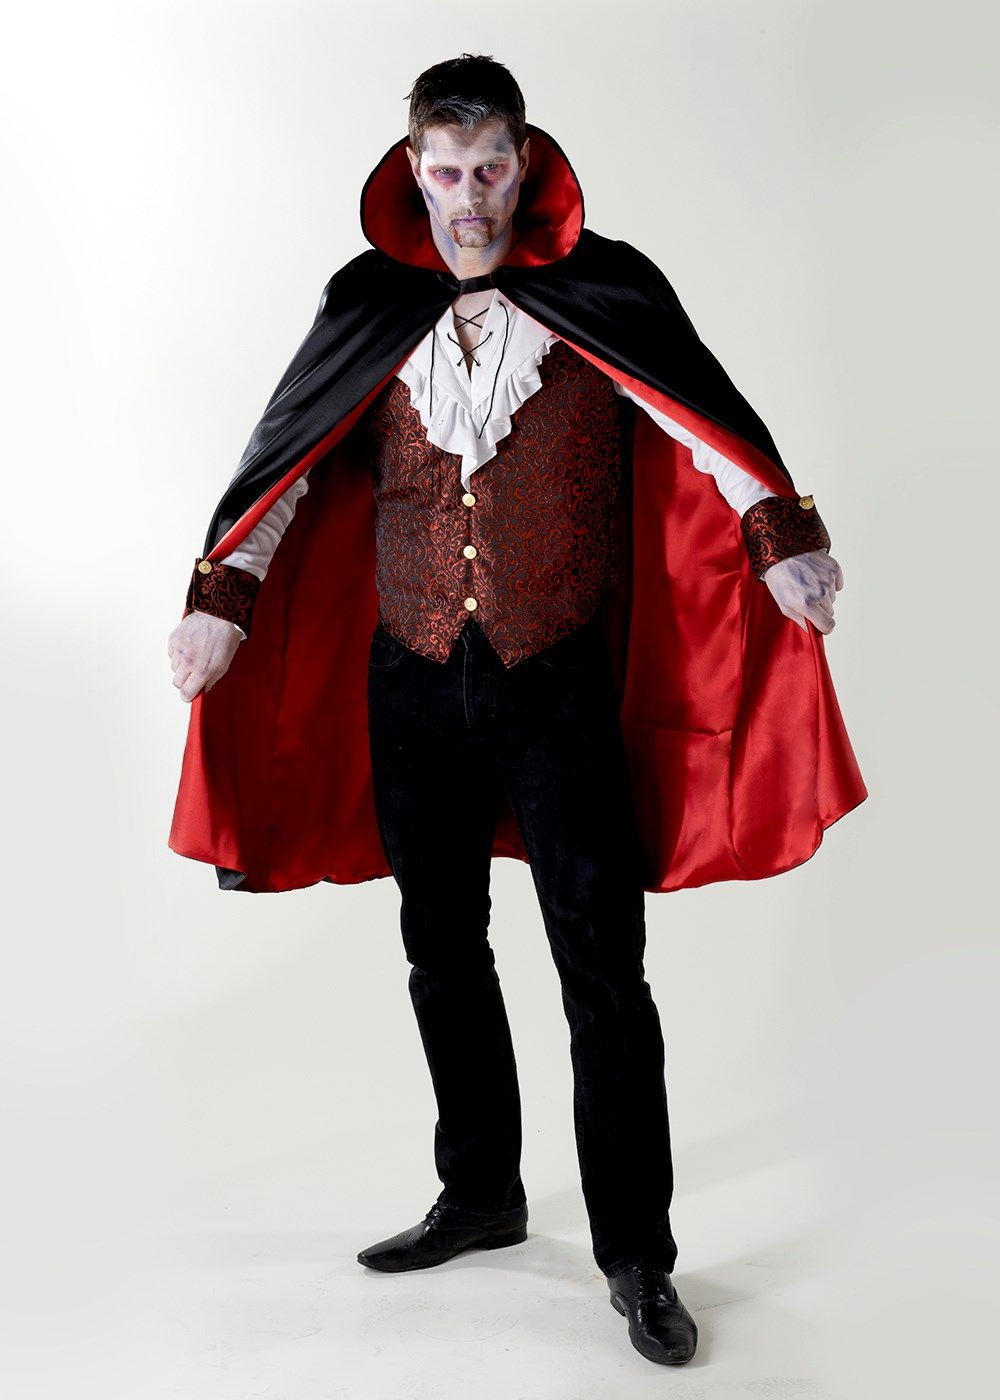 ff04da3f5 Halloween Vampire Fancy Dress Costume. Matalan £20 | Trick or Treat ...